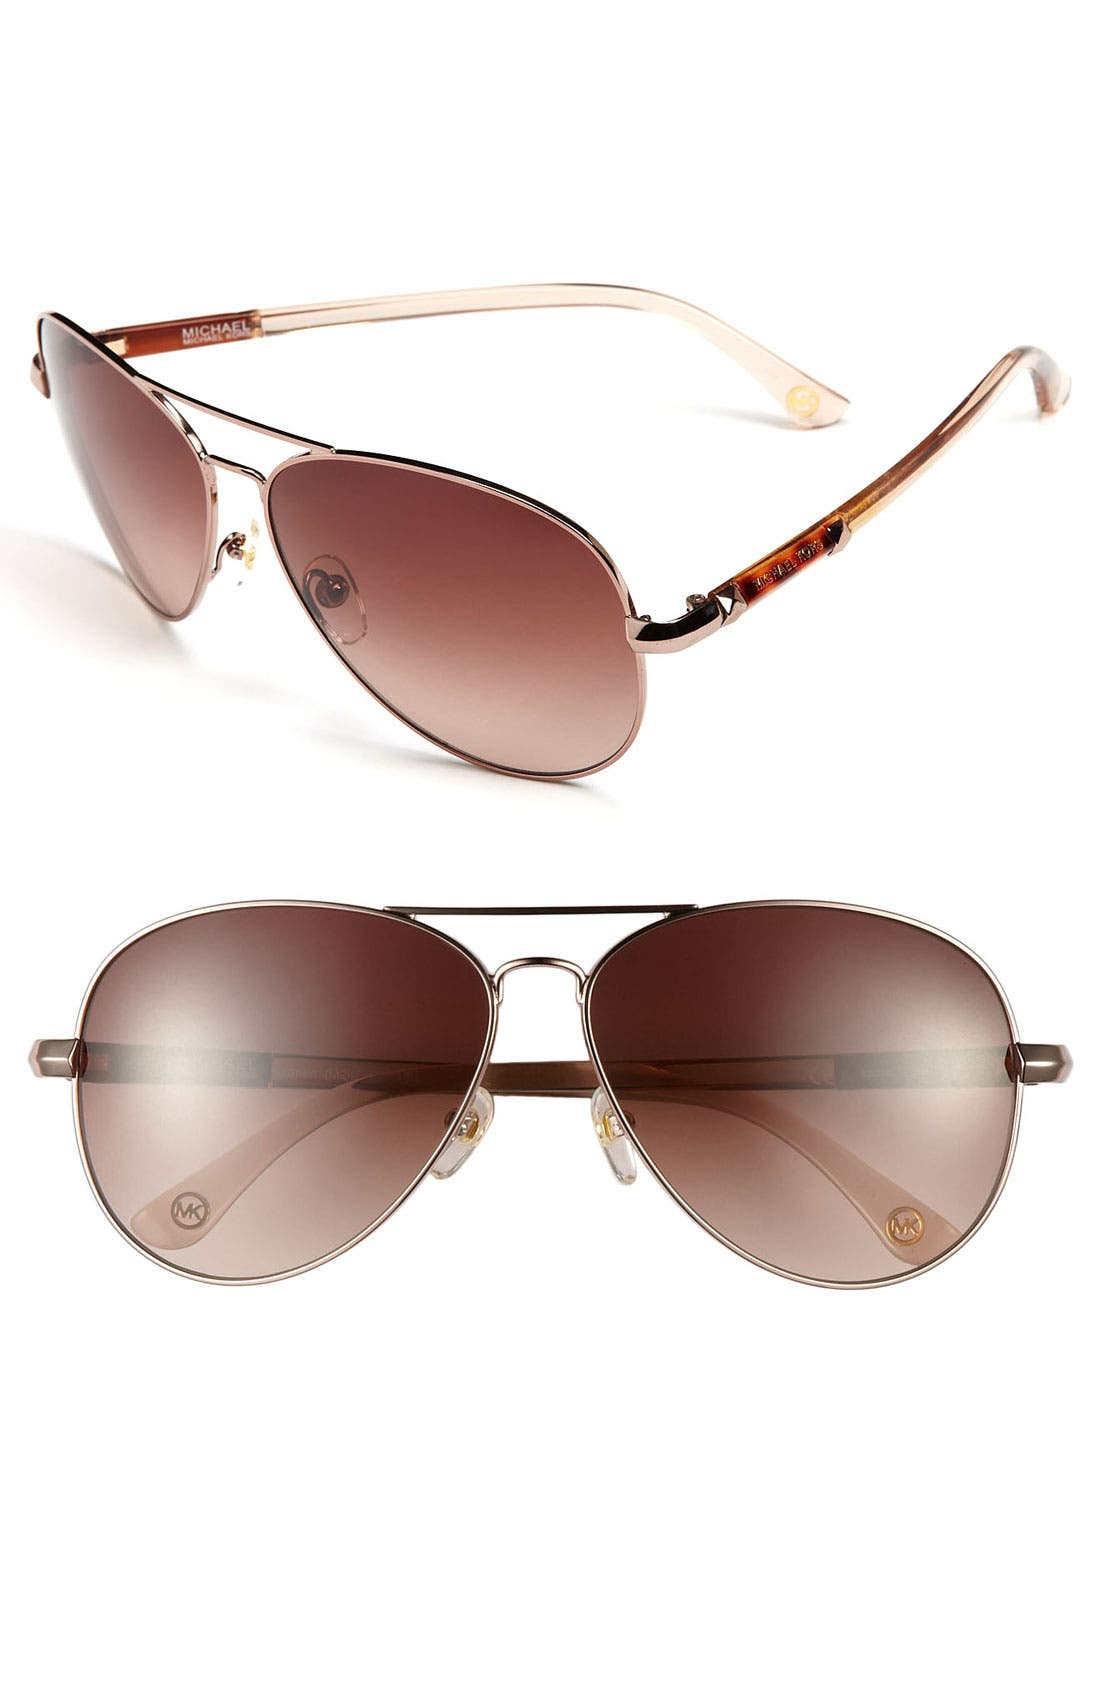 62mm Metal Aviator Sunglasses,                             Main thumbnail 4, color,